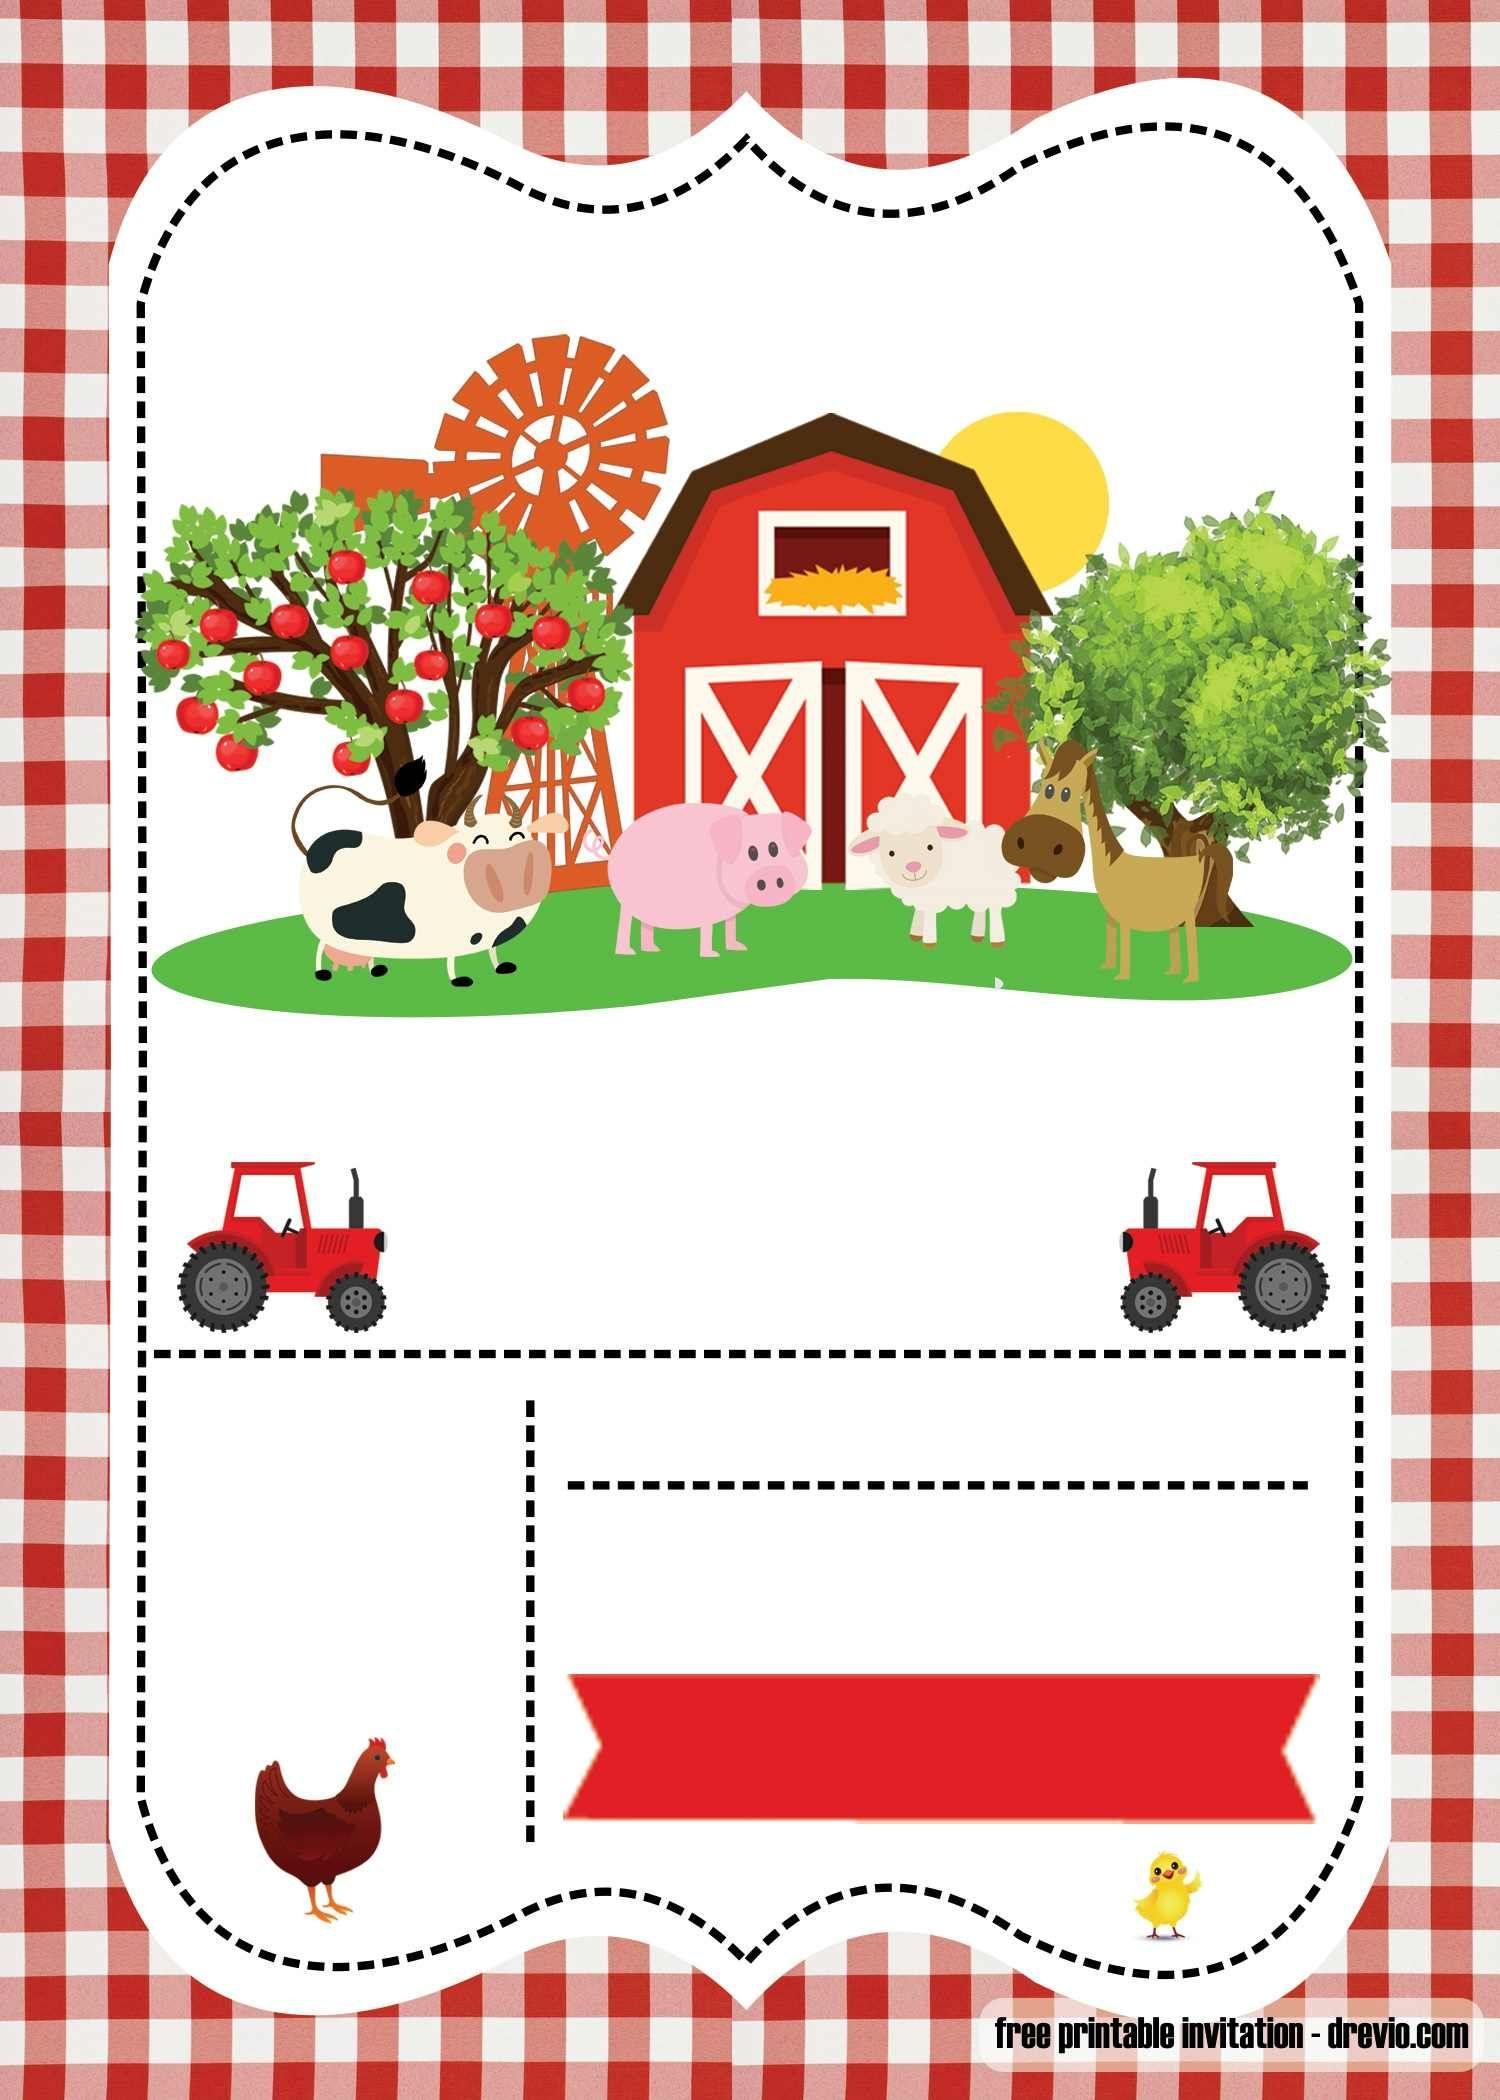 Free Farm Party Invitation Template - Printable | Abigail - Free Printable Farm Birthday Invitations